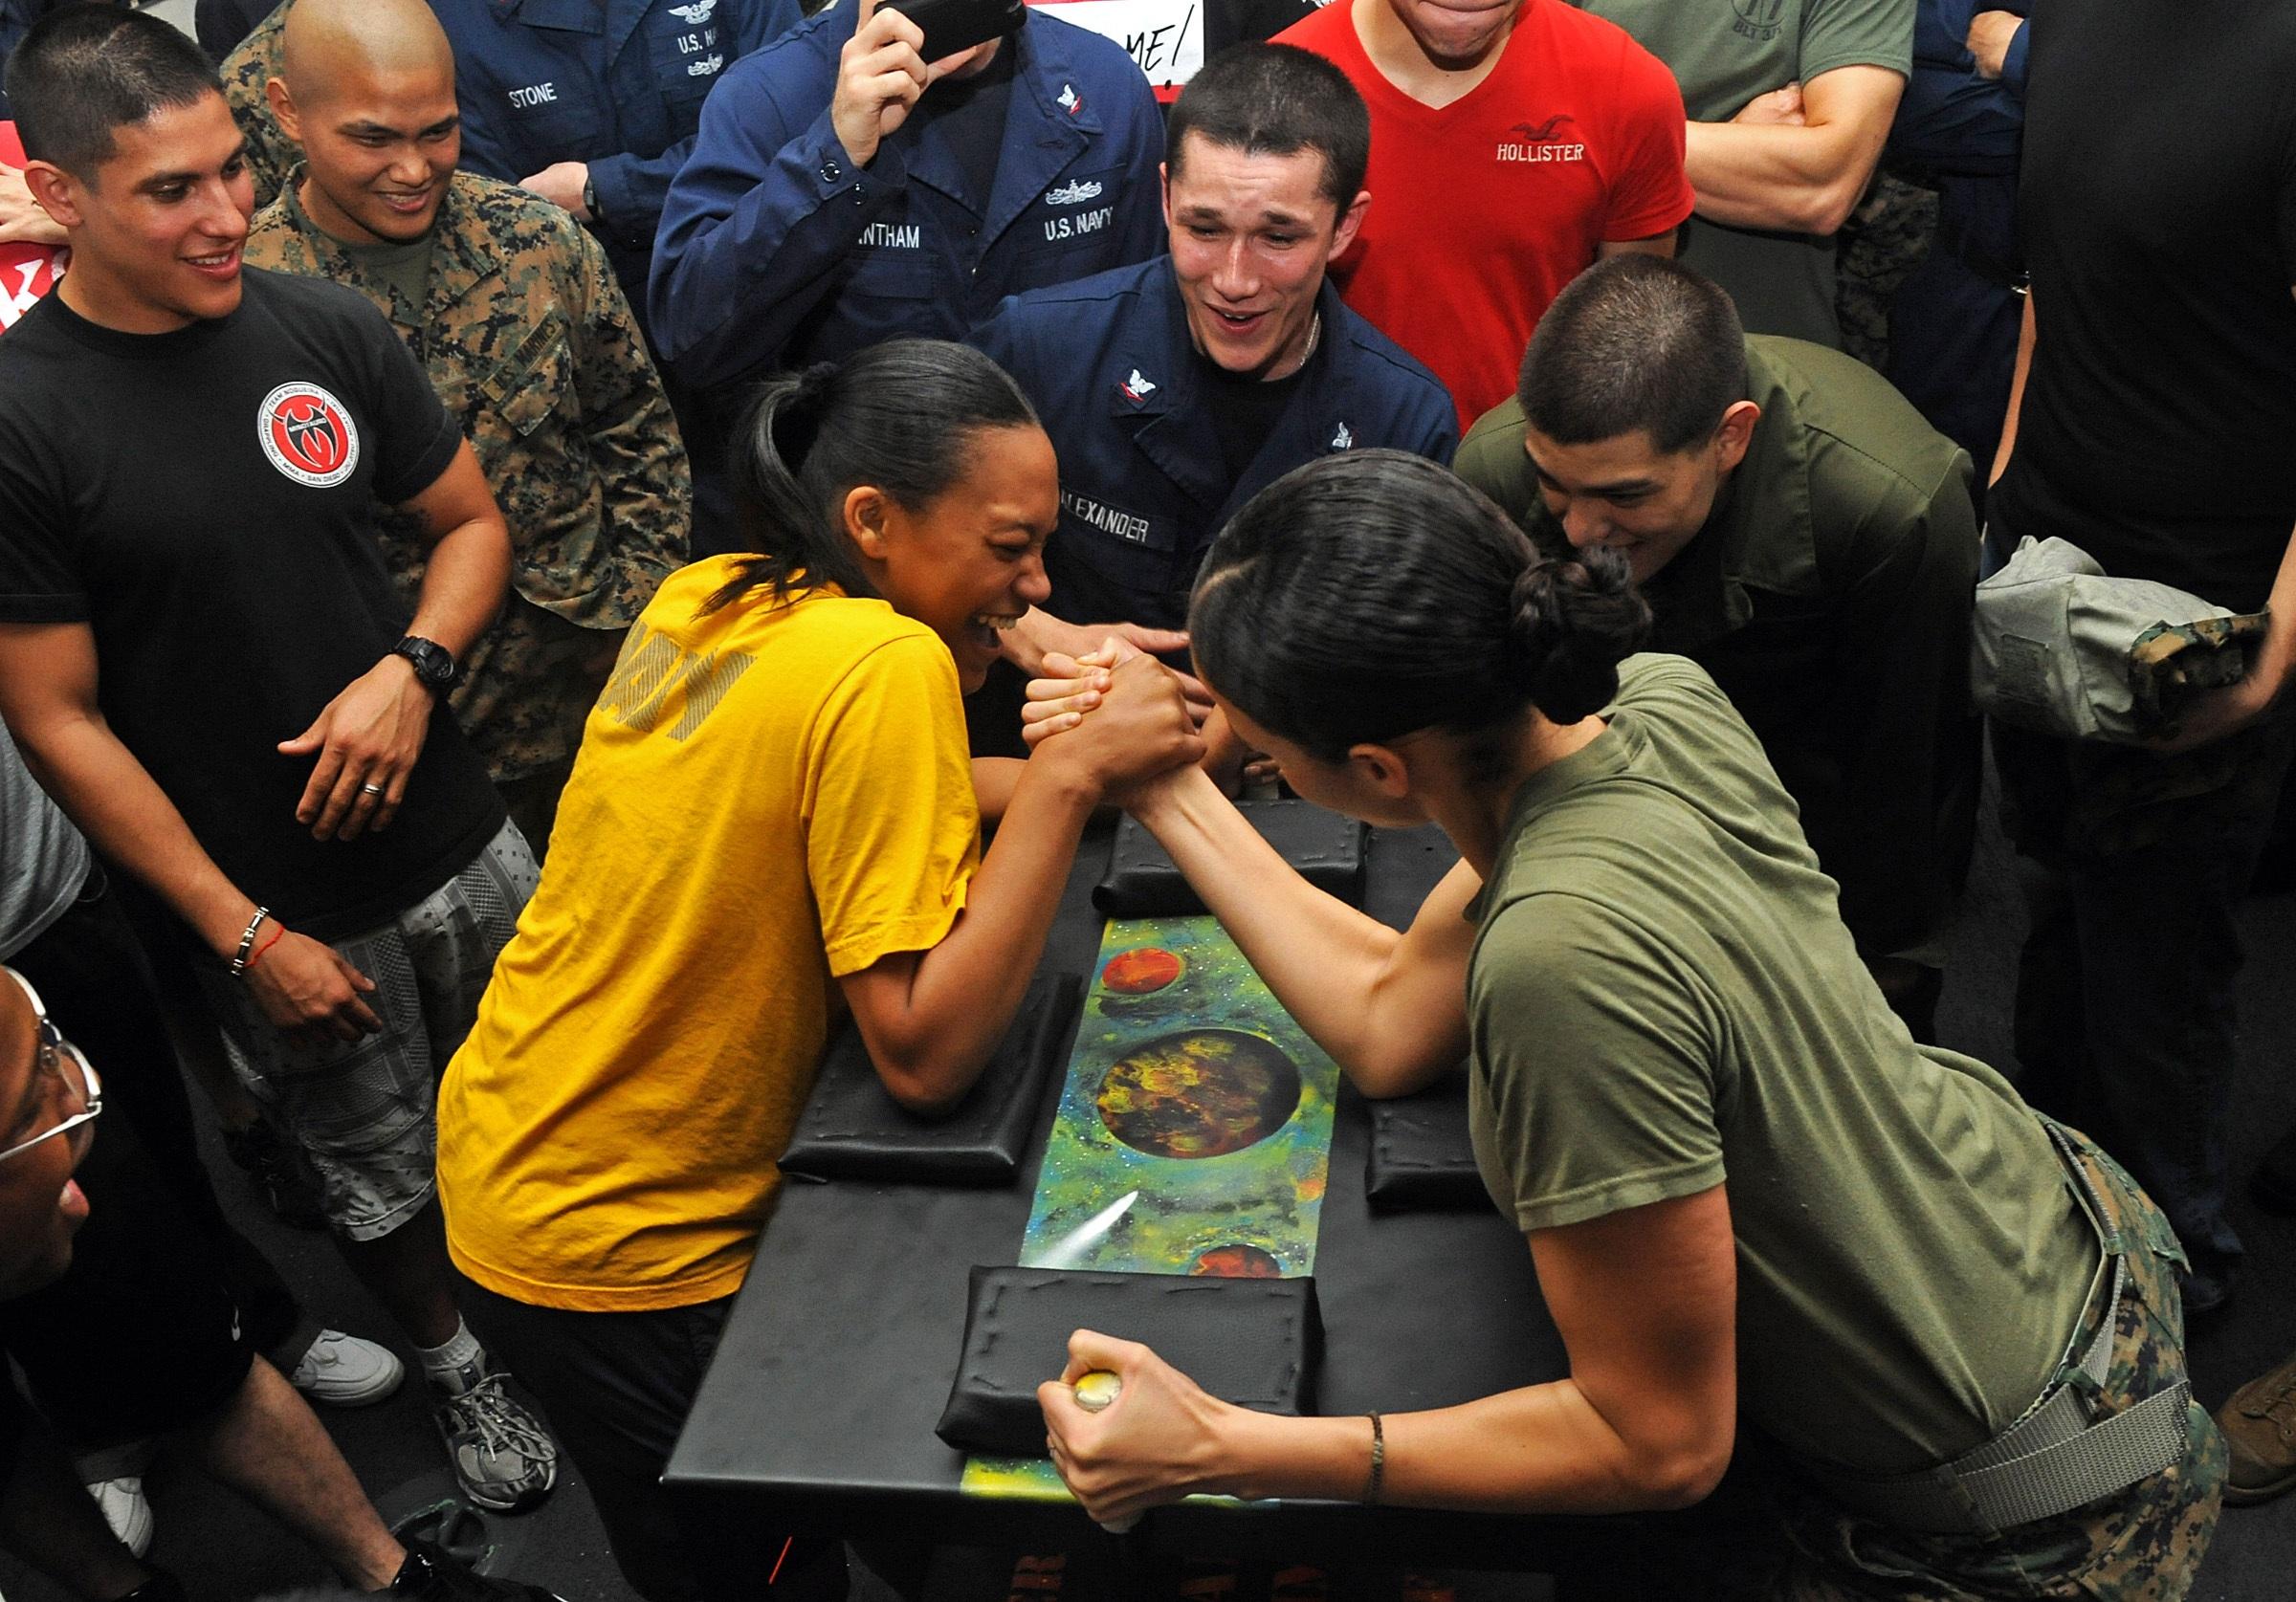 Arm wrestling photo